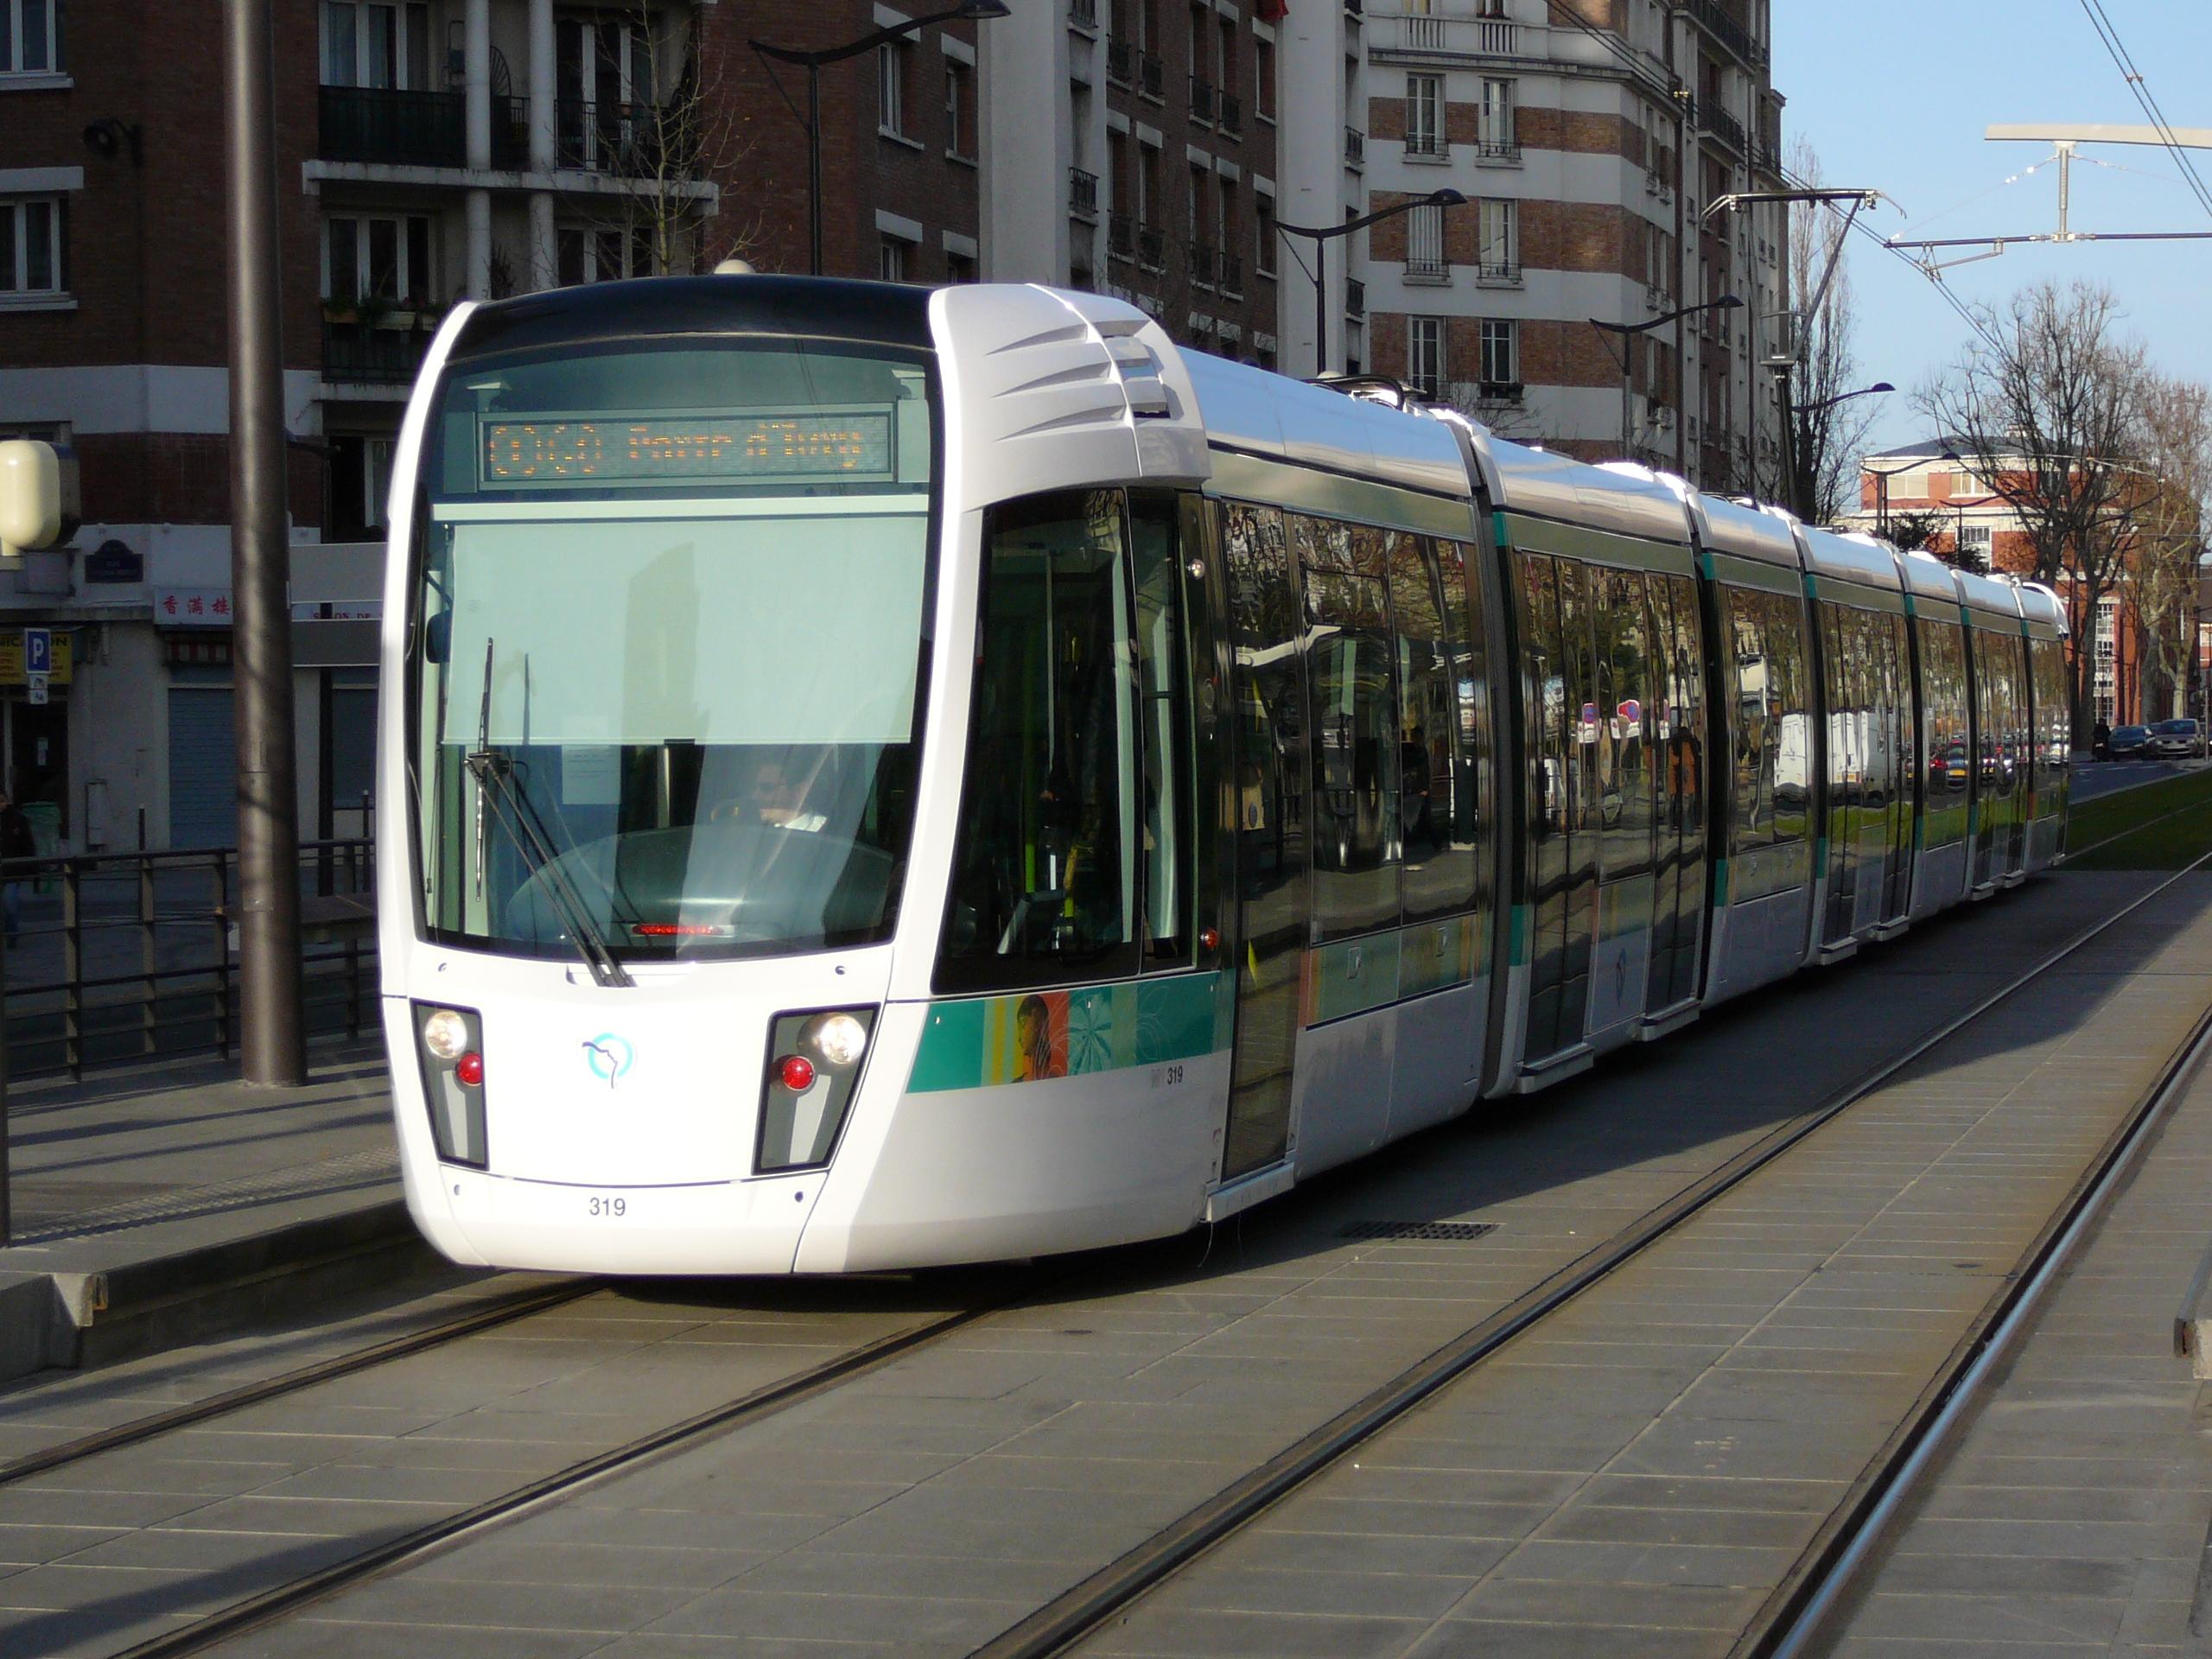 Paris Tram Line T3 | Soundlandscapes' Blog